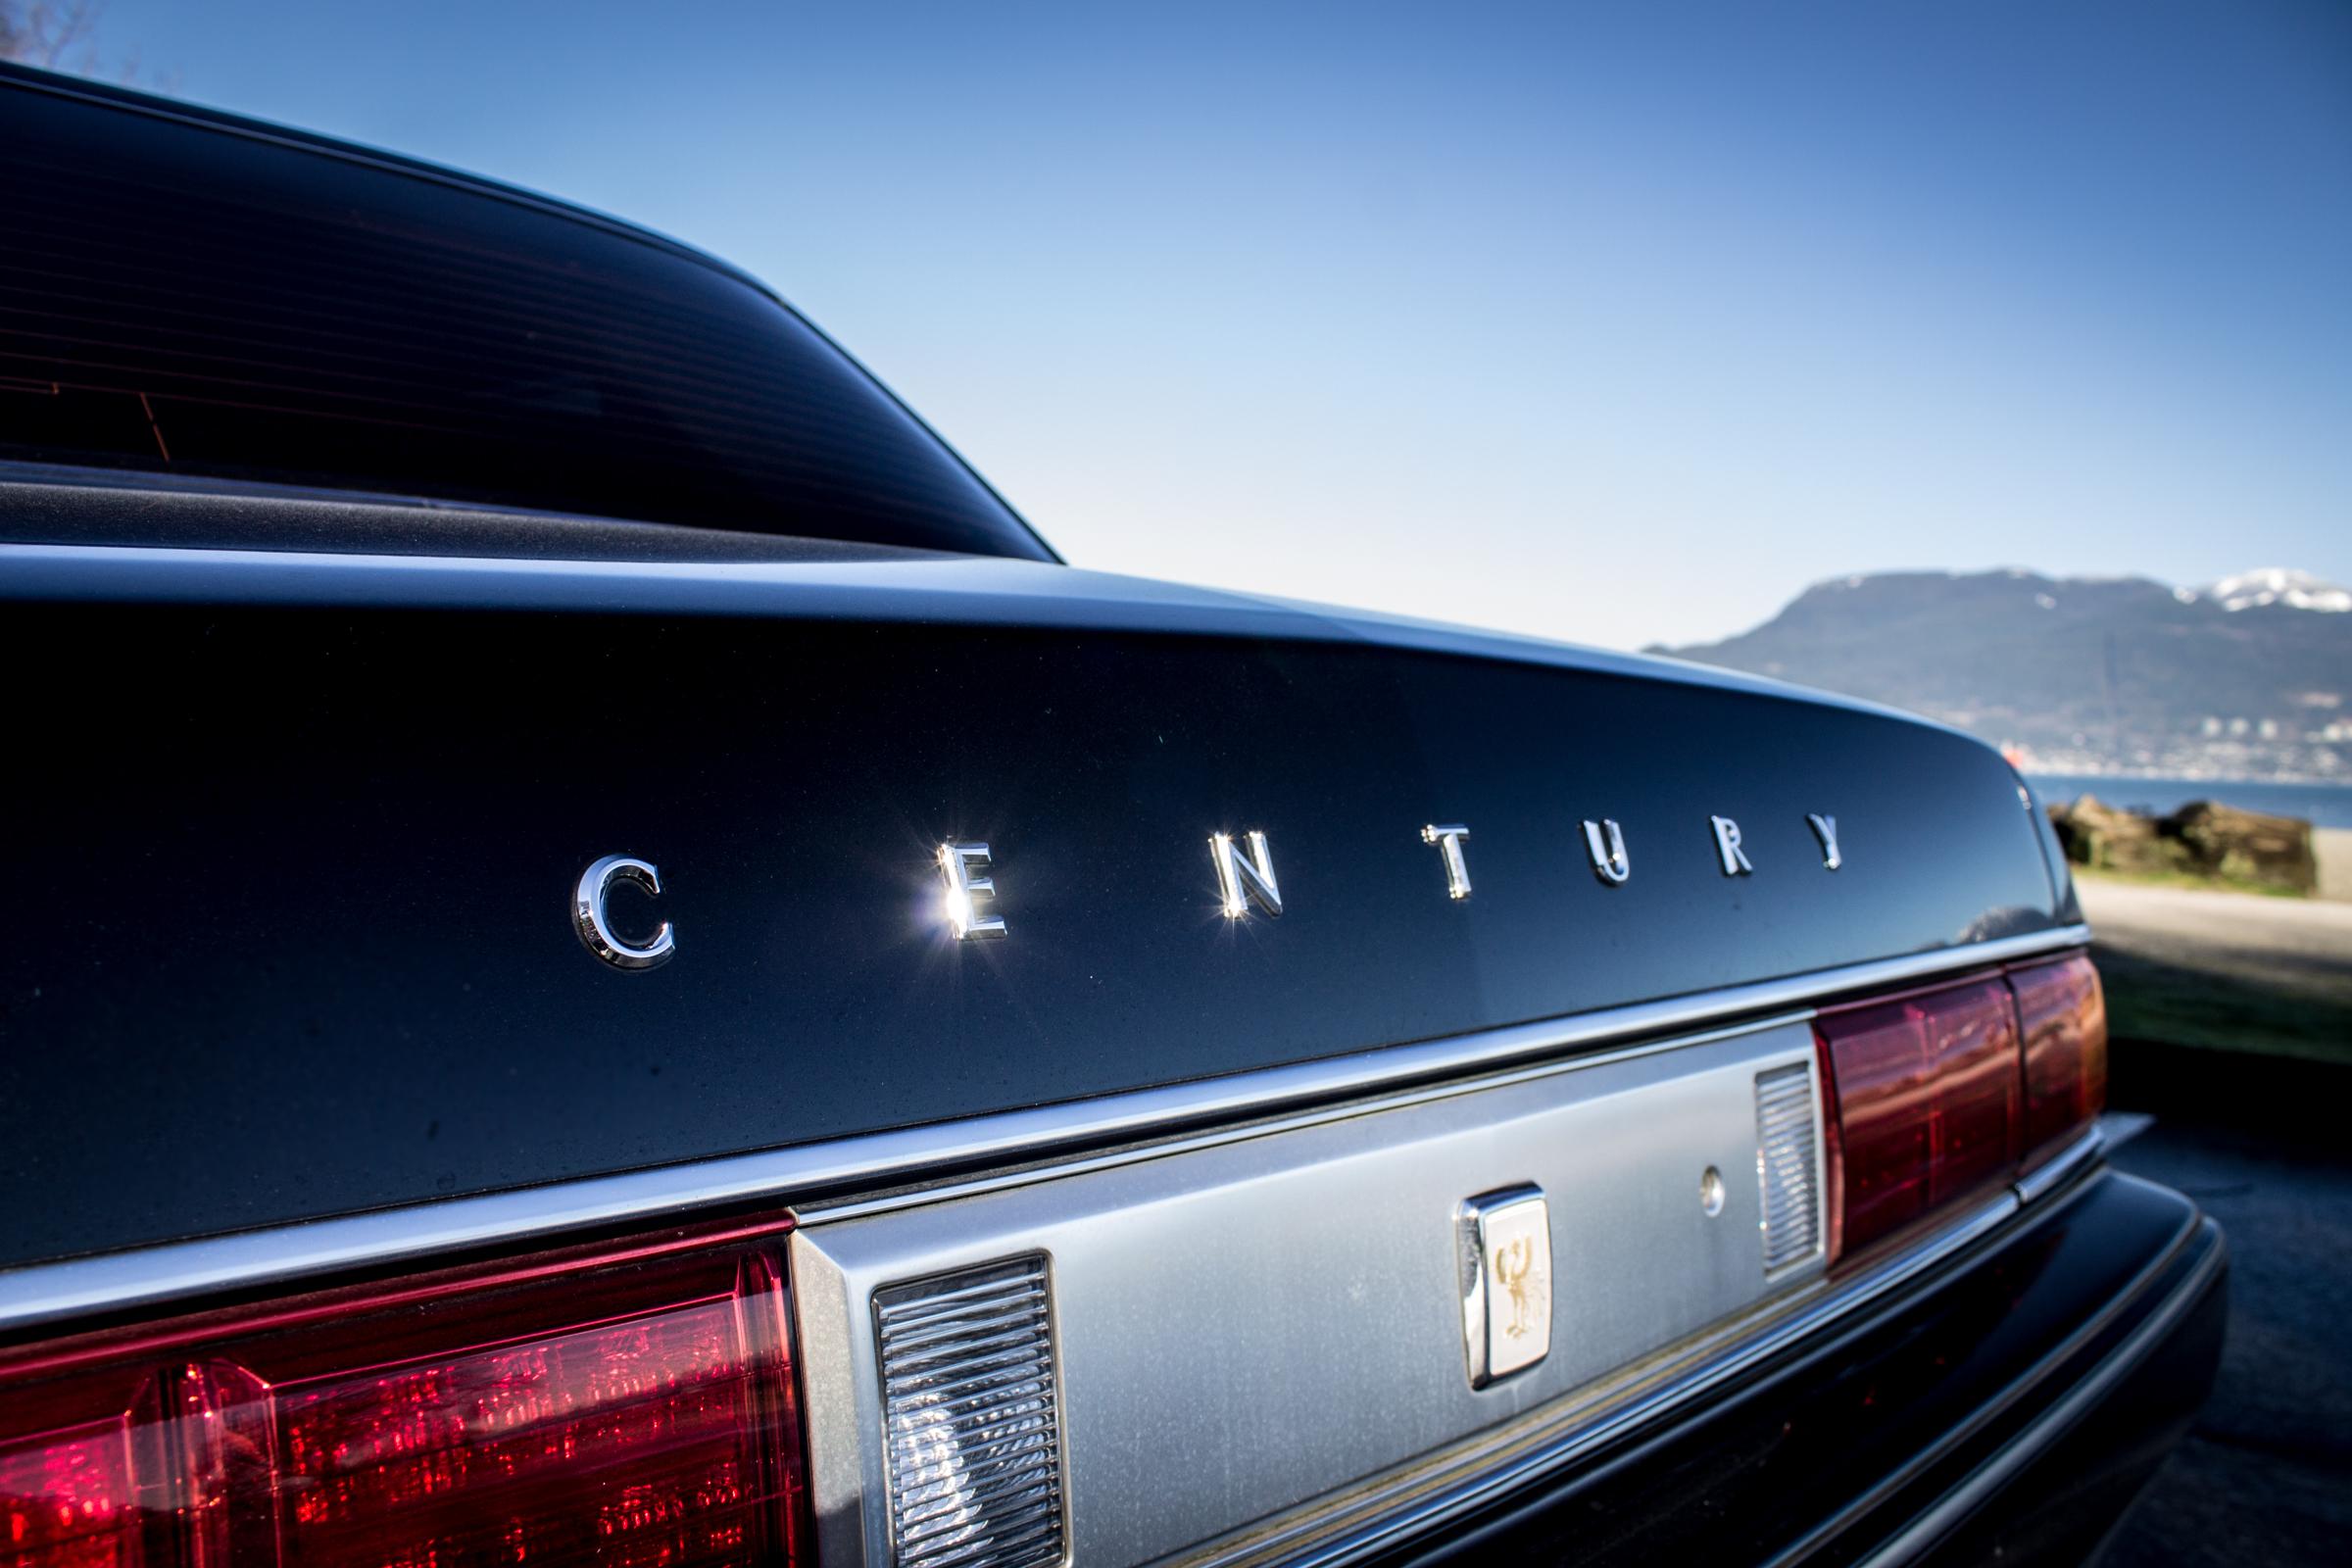 Toyota Century rear detail